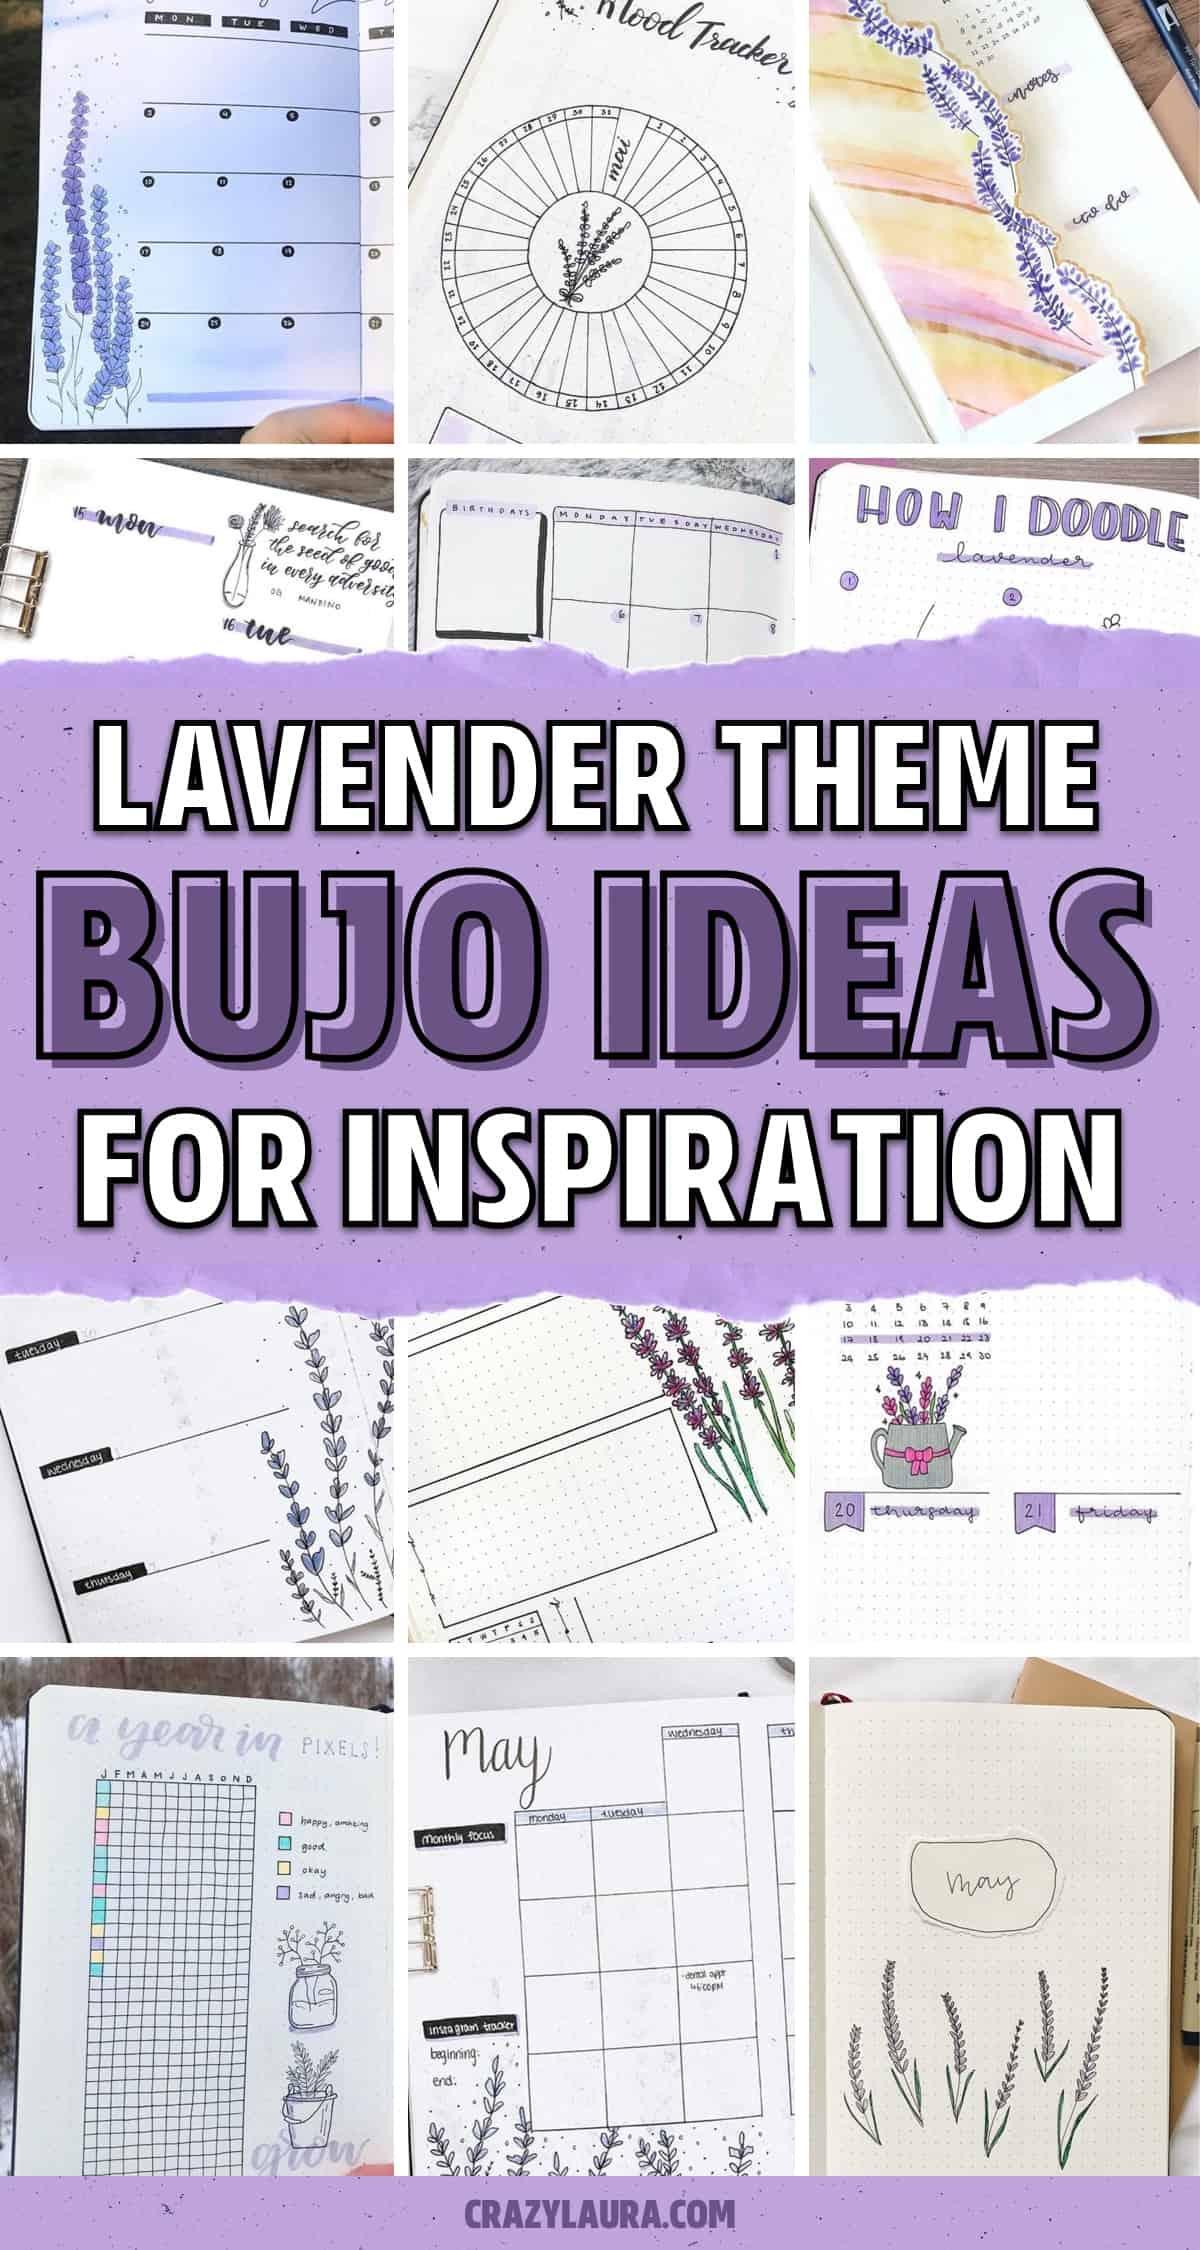 lavender decoration for bujo spreads